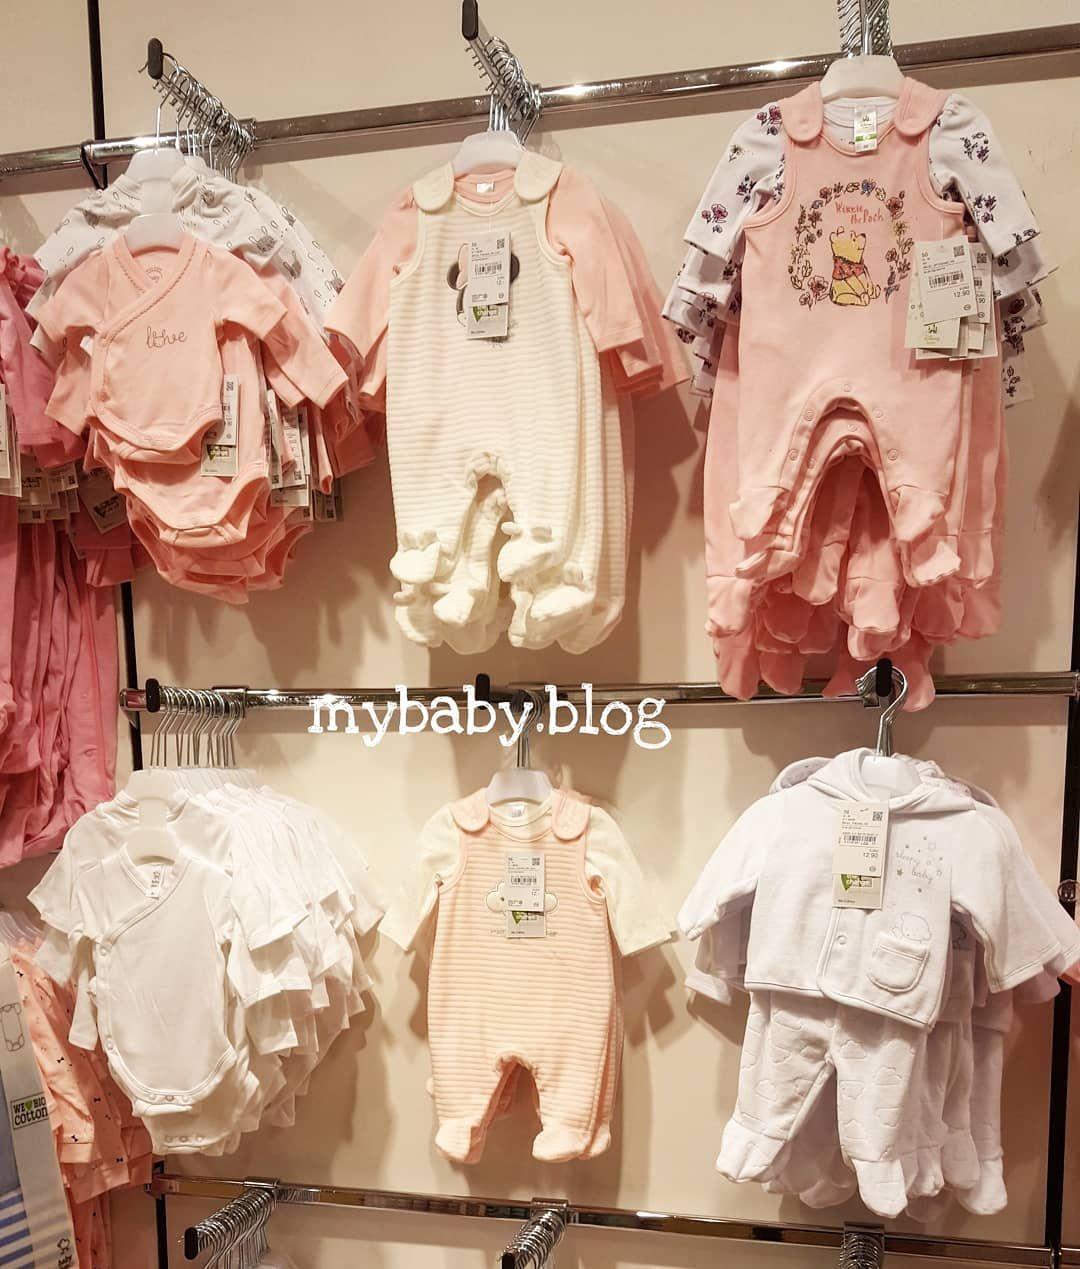 "MyBaby Blog on Instagram: ""Aktuell bei C&A 🎀 Mega süße Strampler & Sets ab 9€ | Anzeige . . . #ca #mybabyblog #babyblogger #mamablogger #saleblogger #angebotblogger…"""